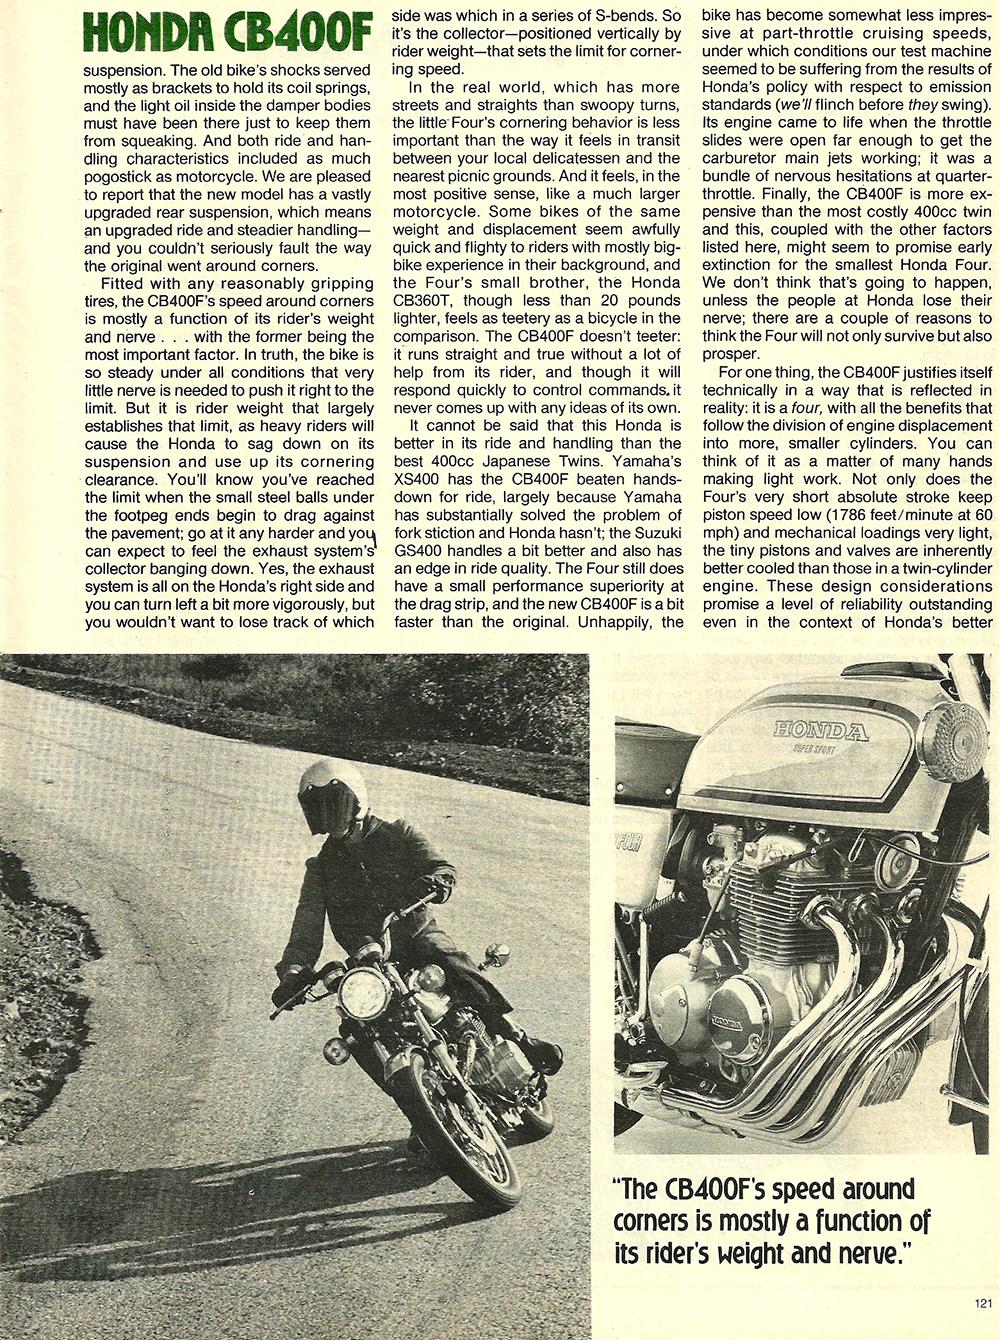 1977 Honda CB400F road test 05.jpg